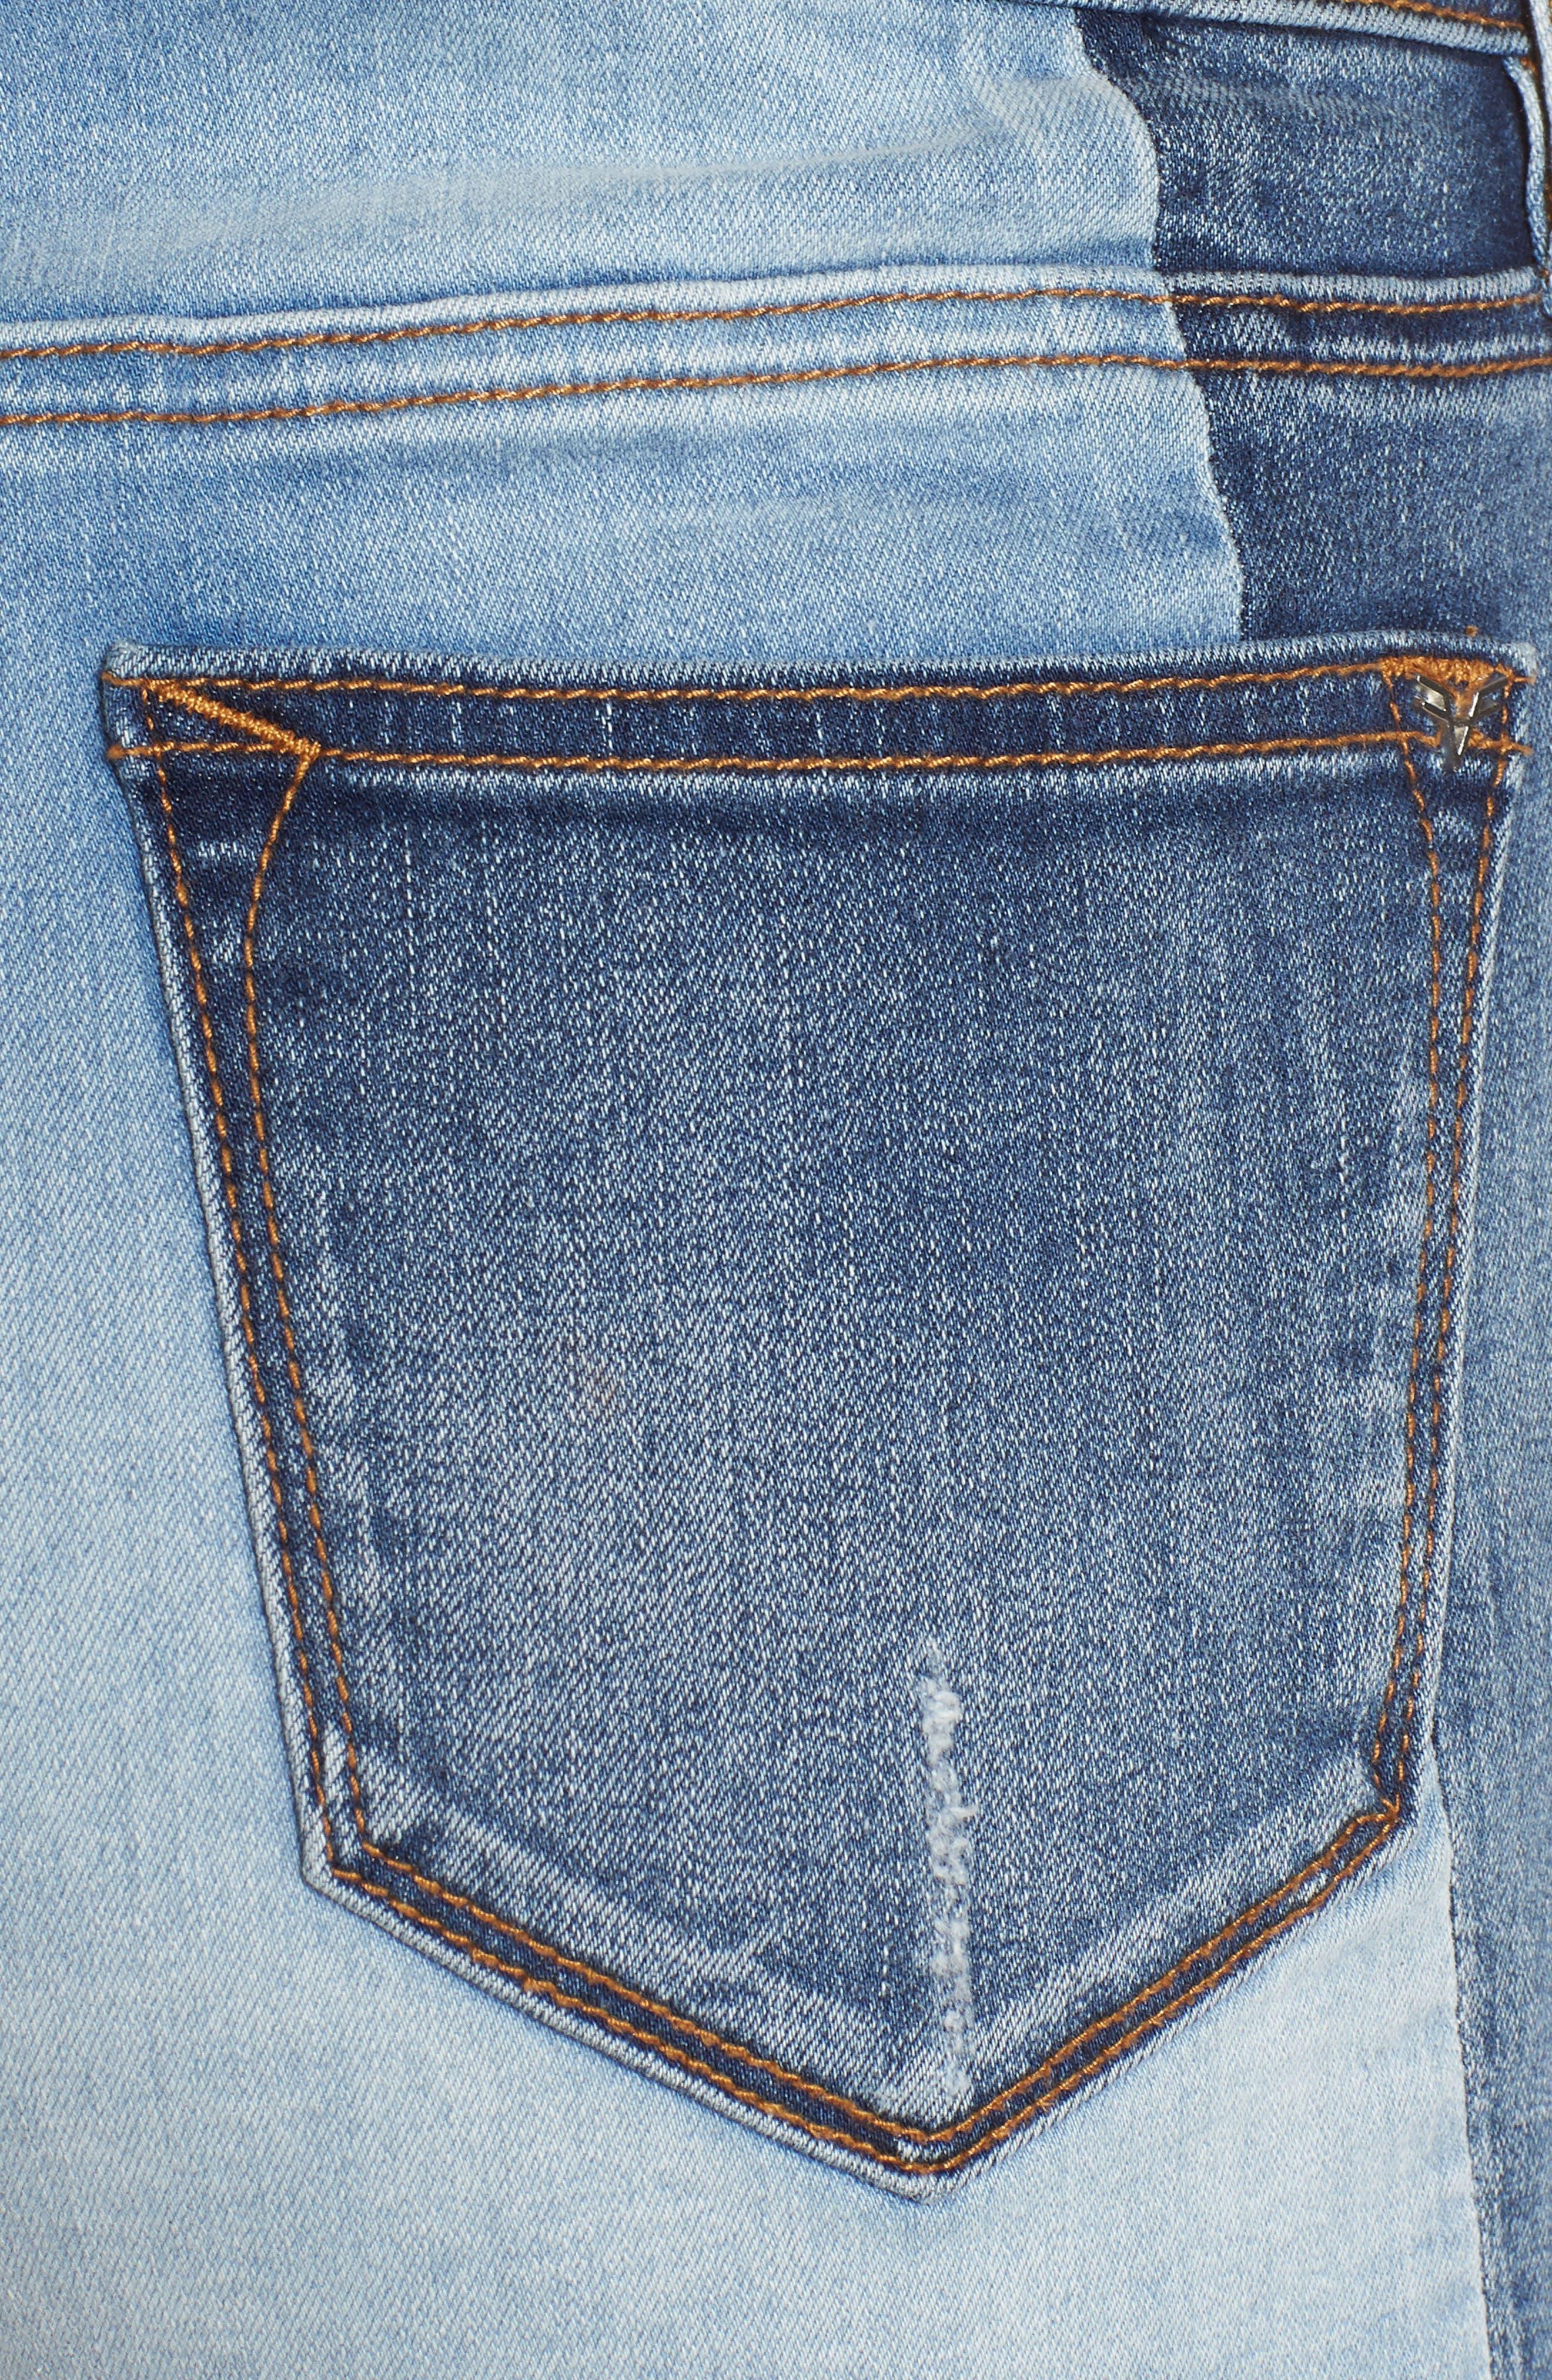 Colorblock Denim Shorts,                             Alternate thumbnail 6, color,                             426